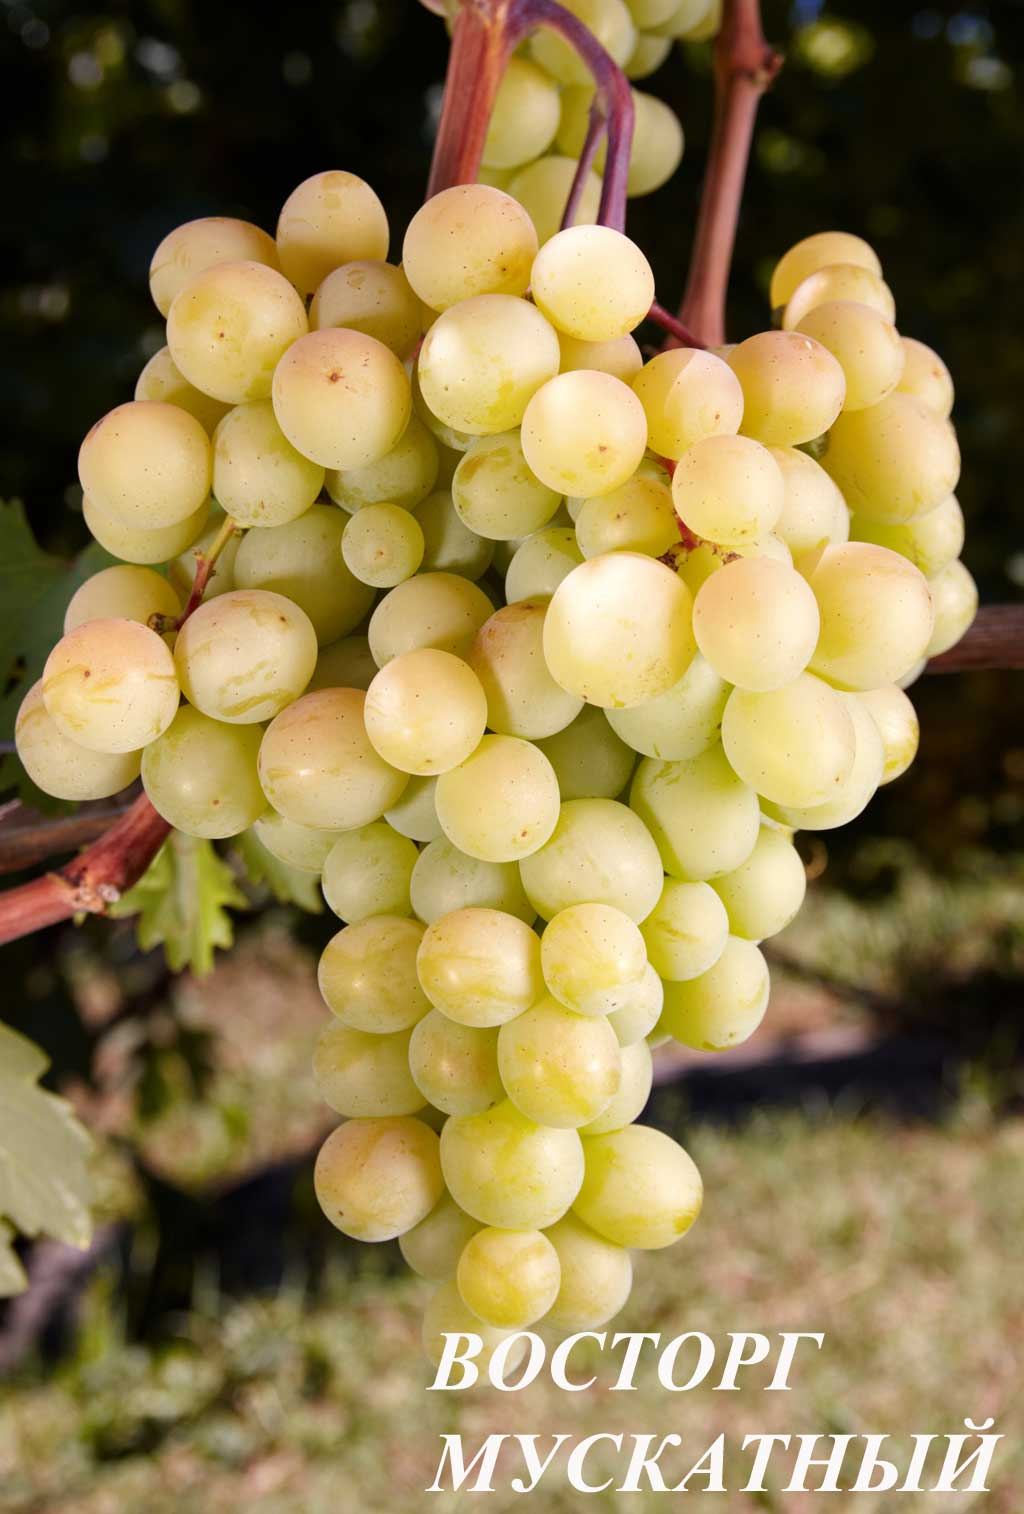 Аксайский маникюр сорт винограда фото